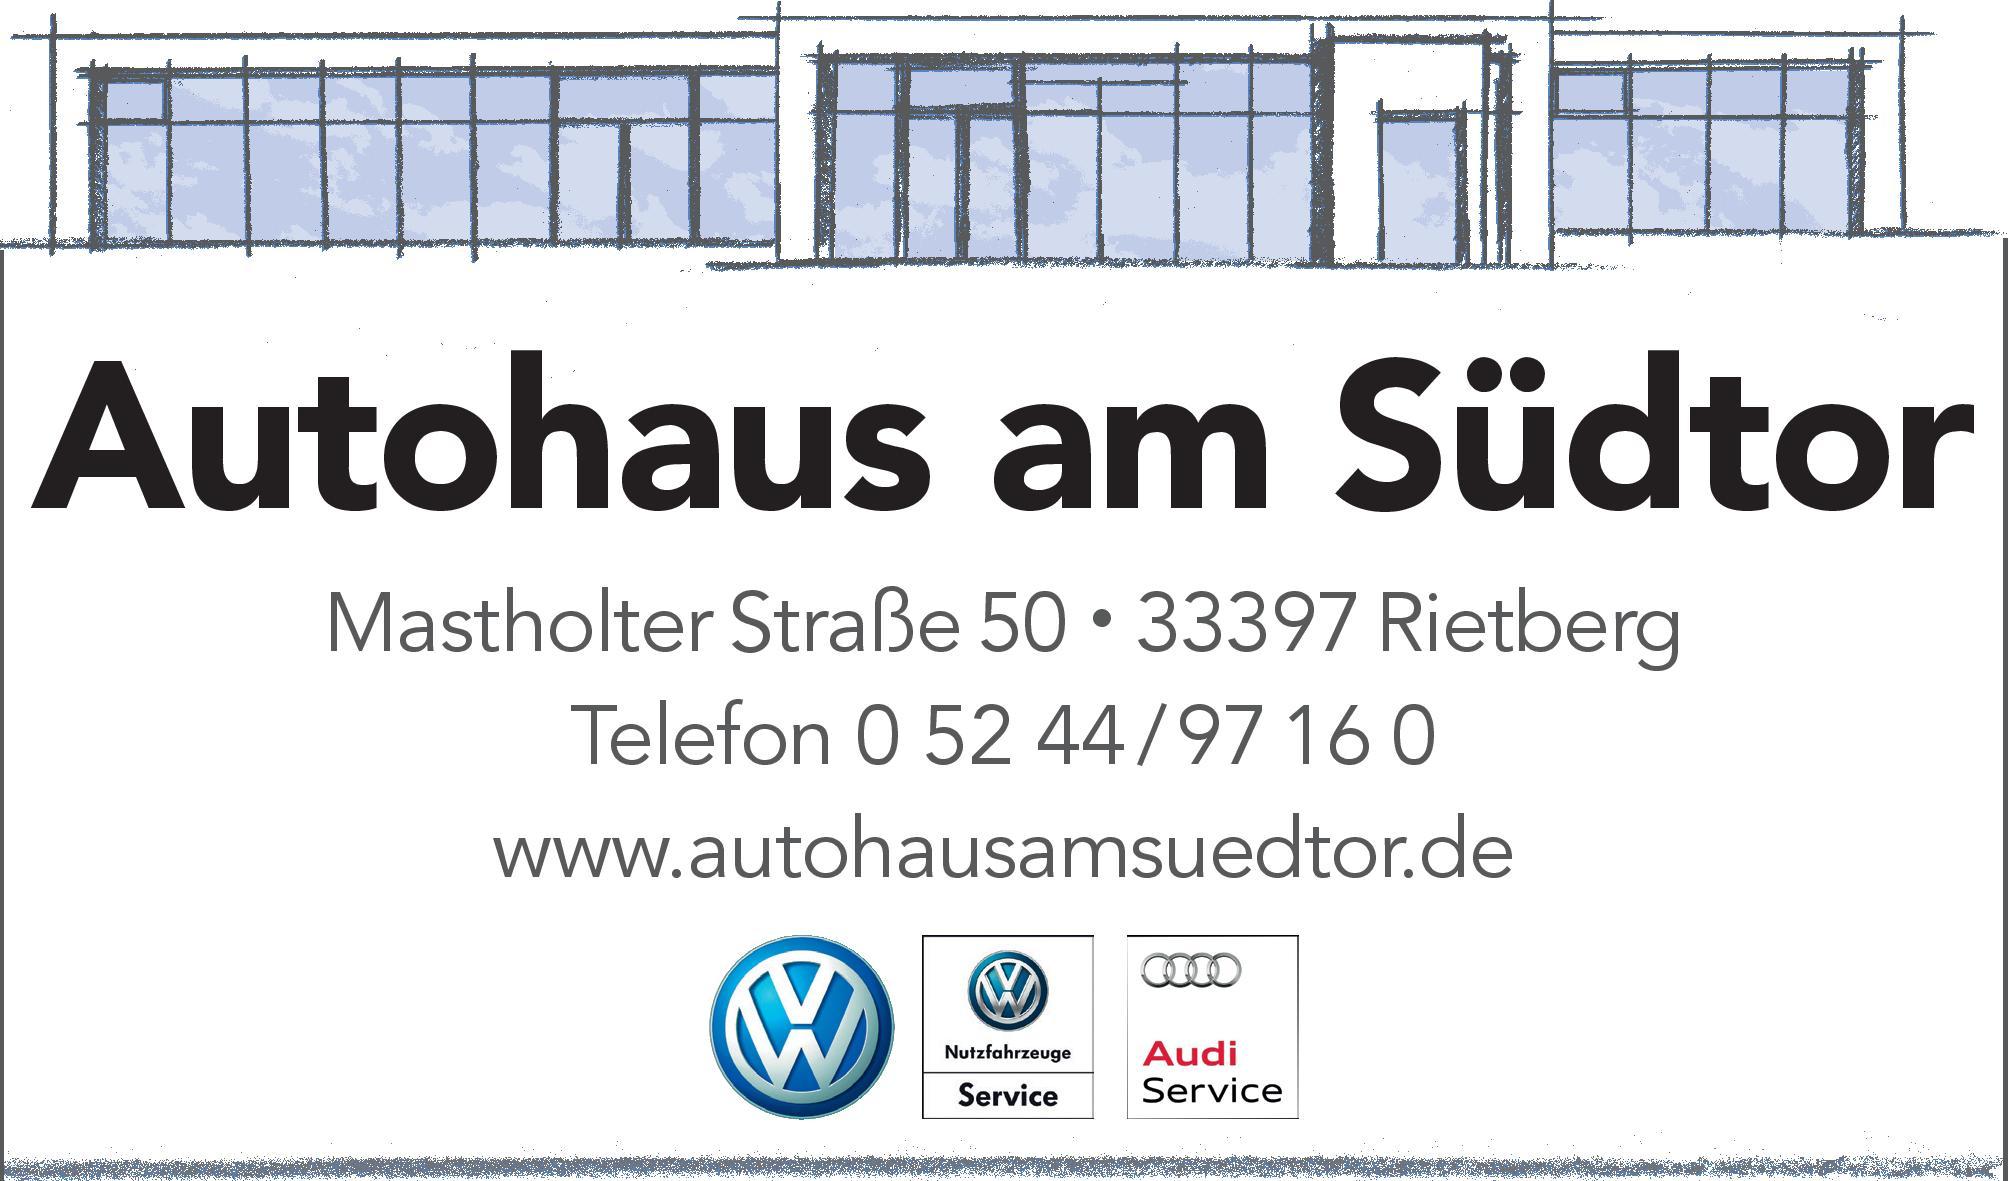 Autohaus_am_Suedtor